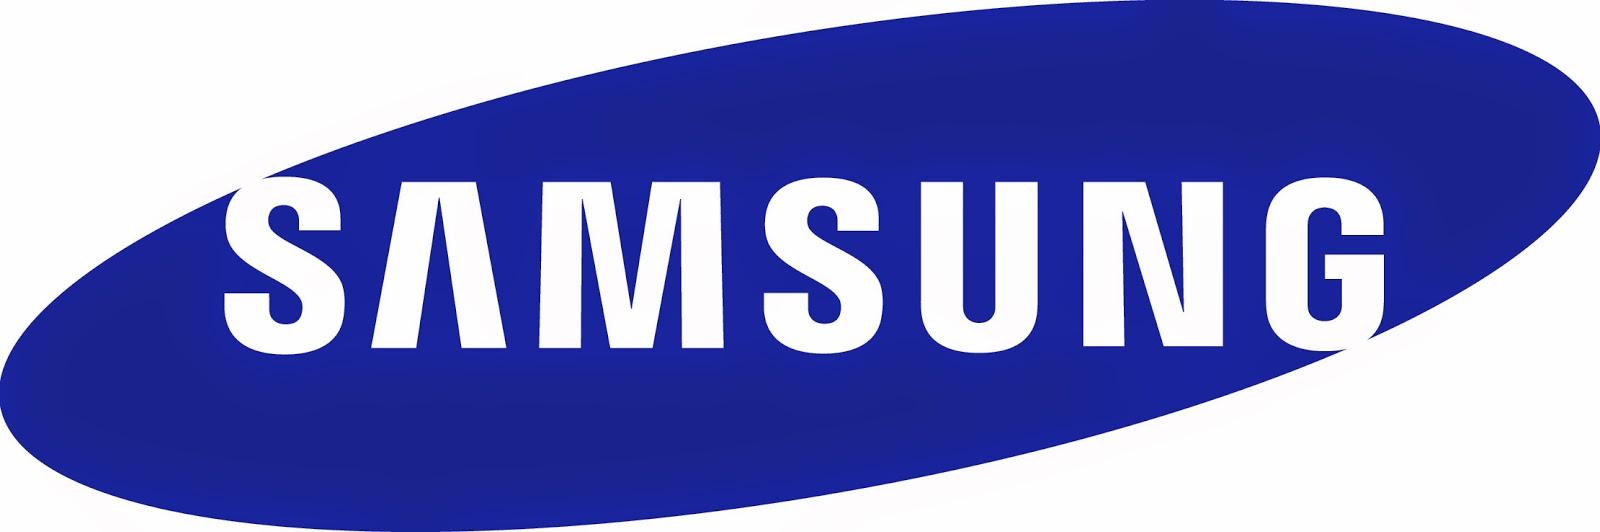 Daftar Rekap Smartphone Samsung yang Telah Mendapat Firmware Terbaru